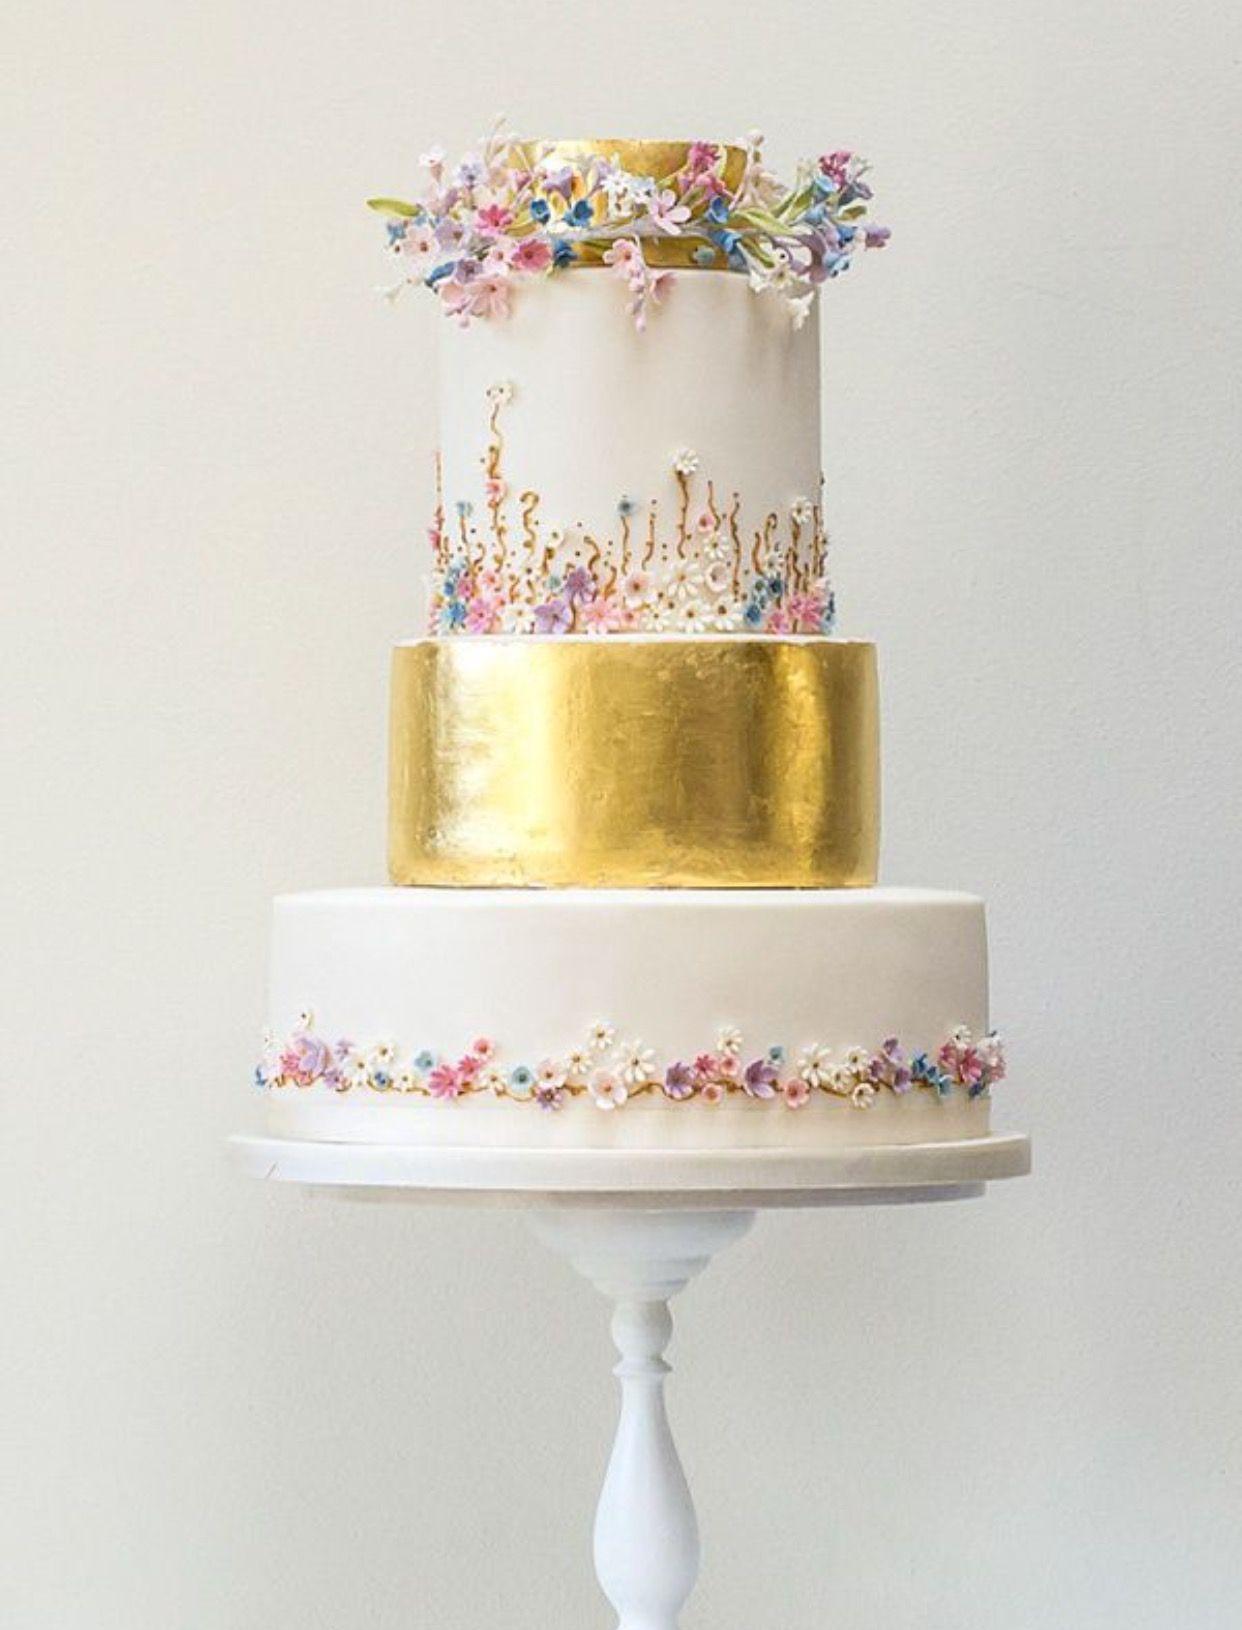 Pin by cj mercado on cake pinterest cake wedding cake and